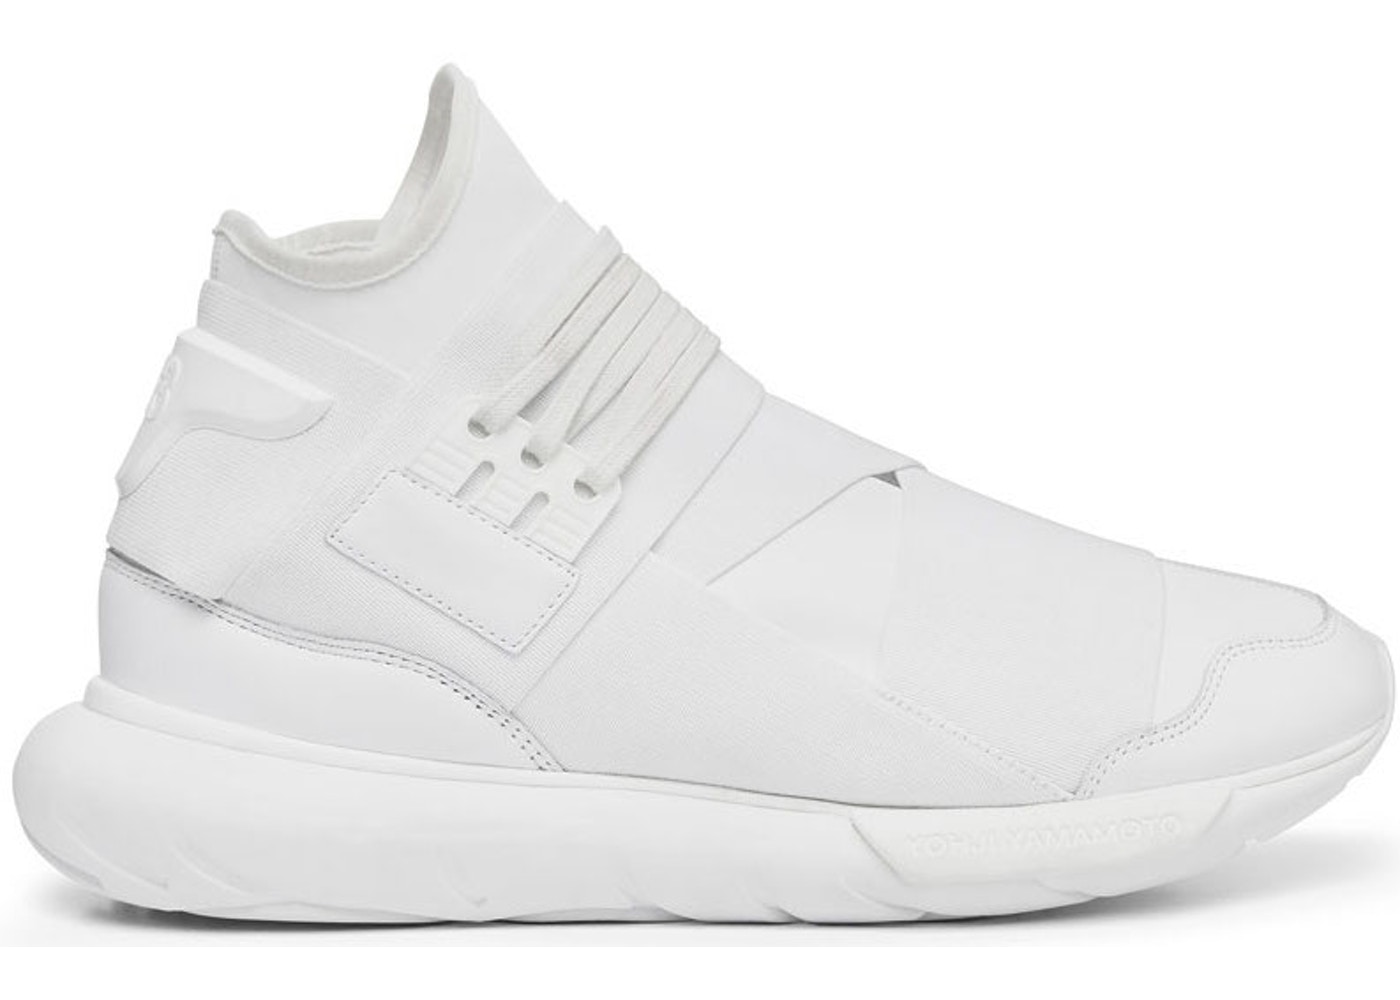 new product b1fa6 16d9f Y-3 Qasa High Triple White - AQ5500